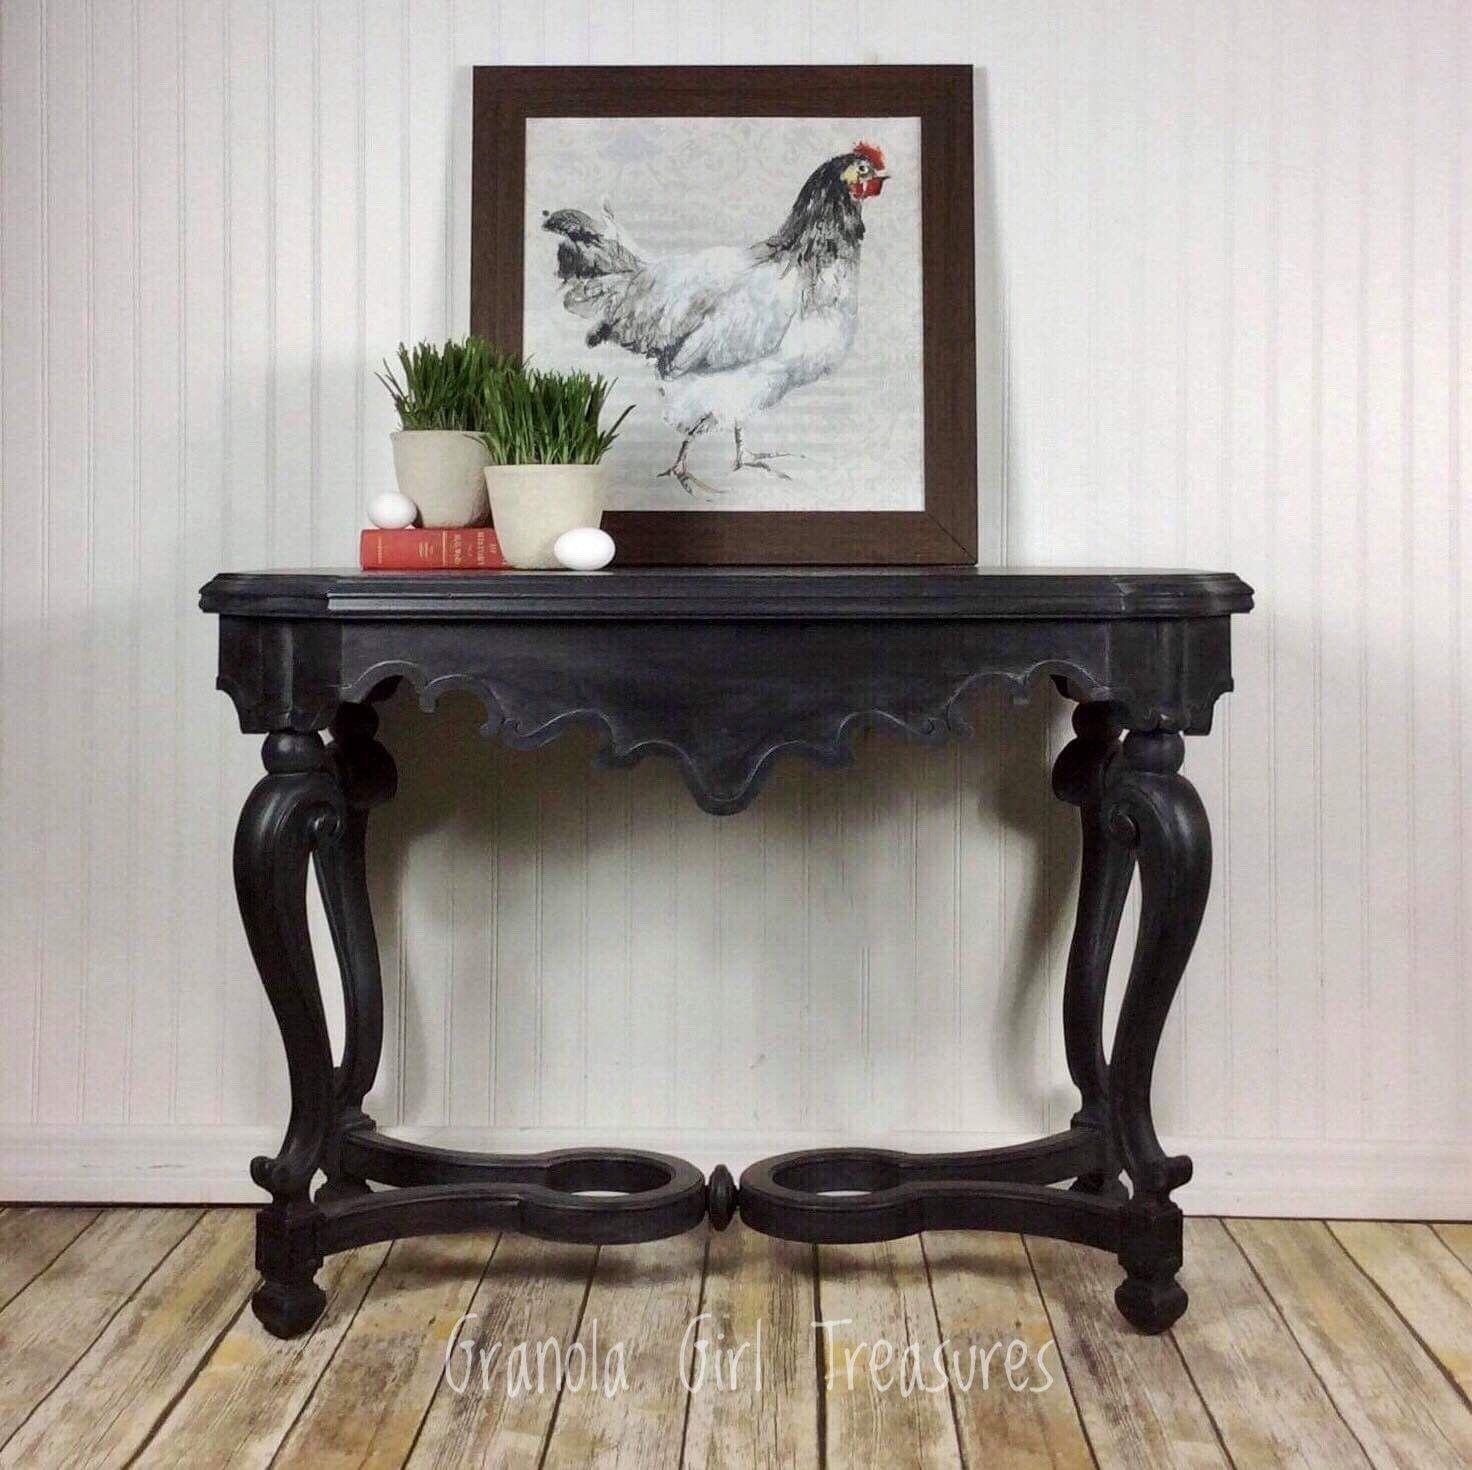 Pin by Granola Girl Treasures on Granola Girl Furniture in ...